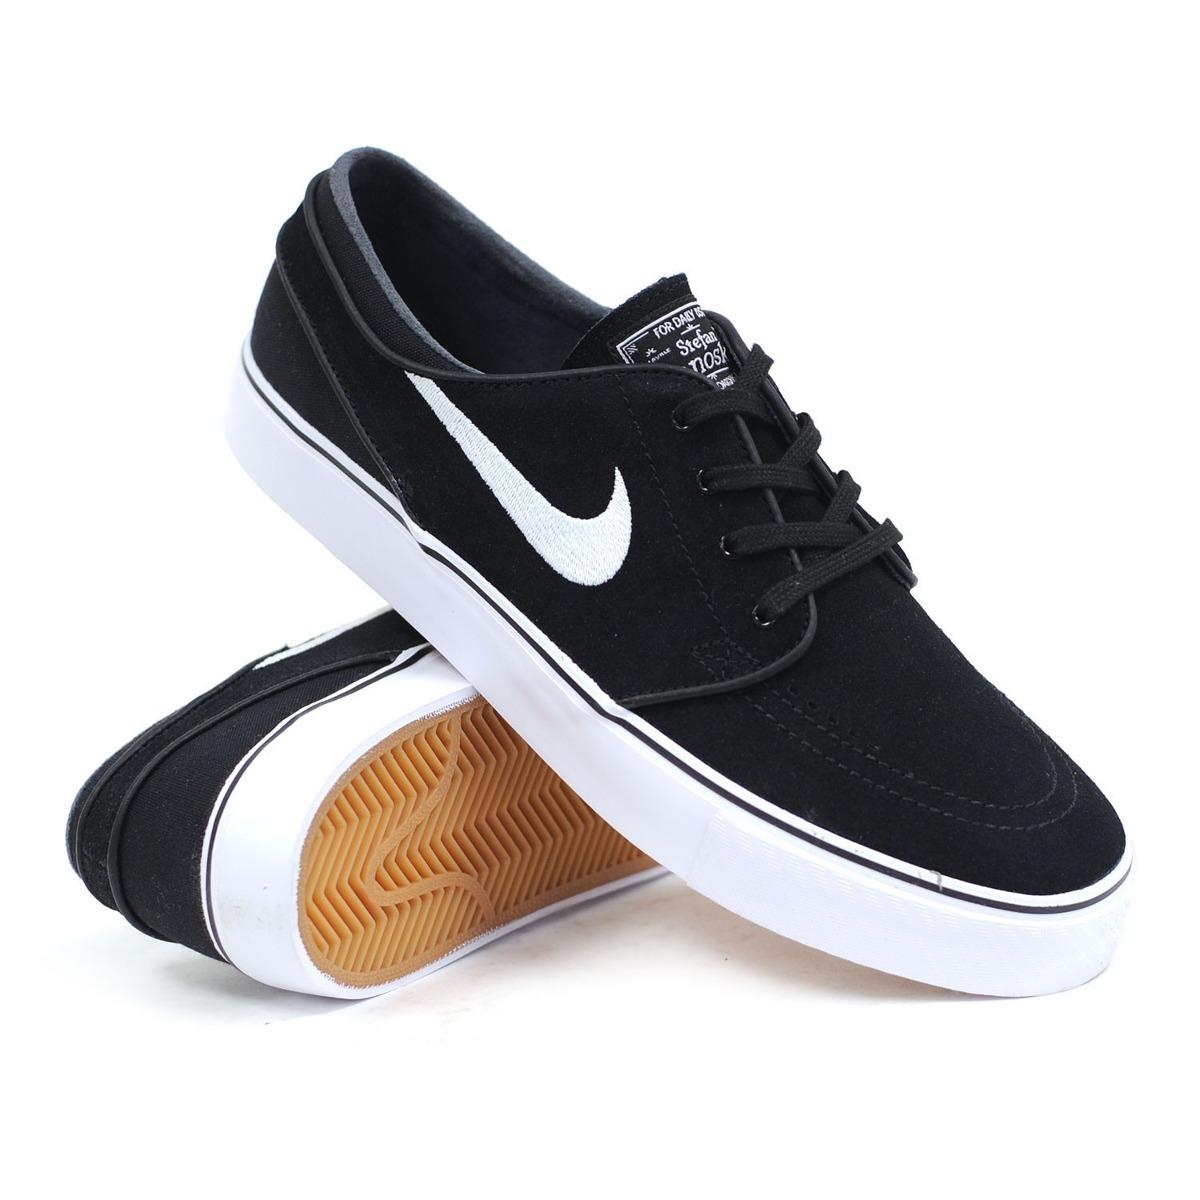 c94e114d339 zapatillas nike skate venta